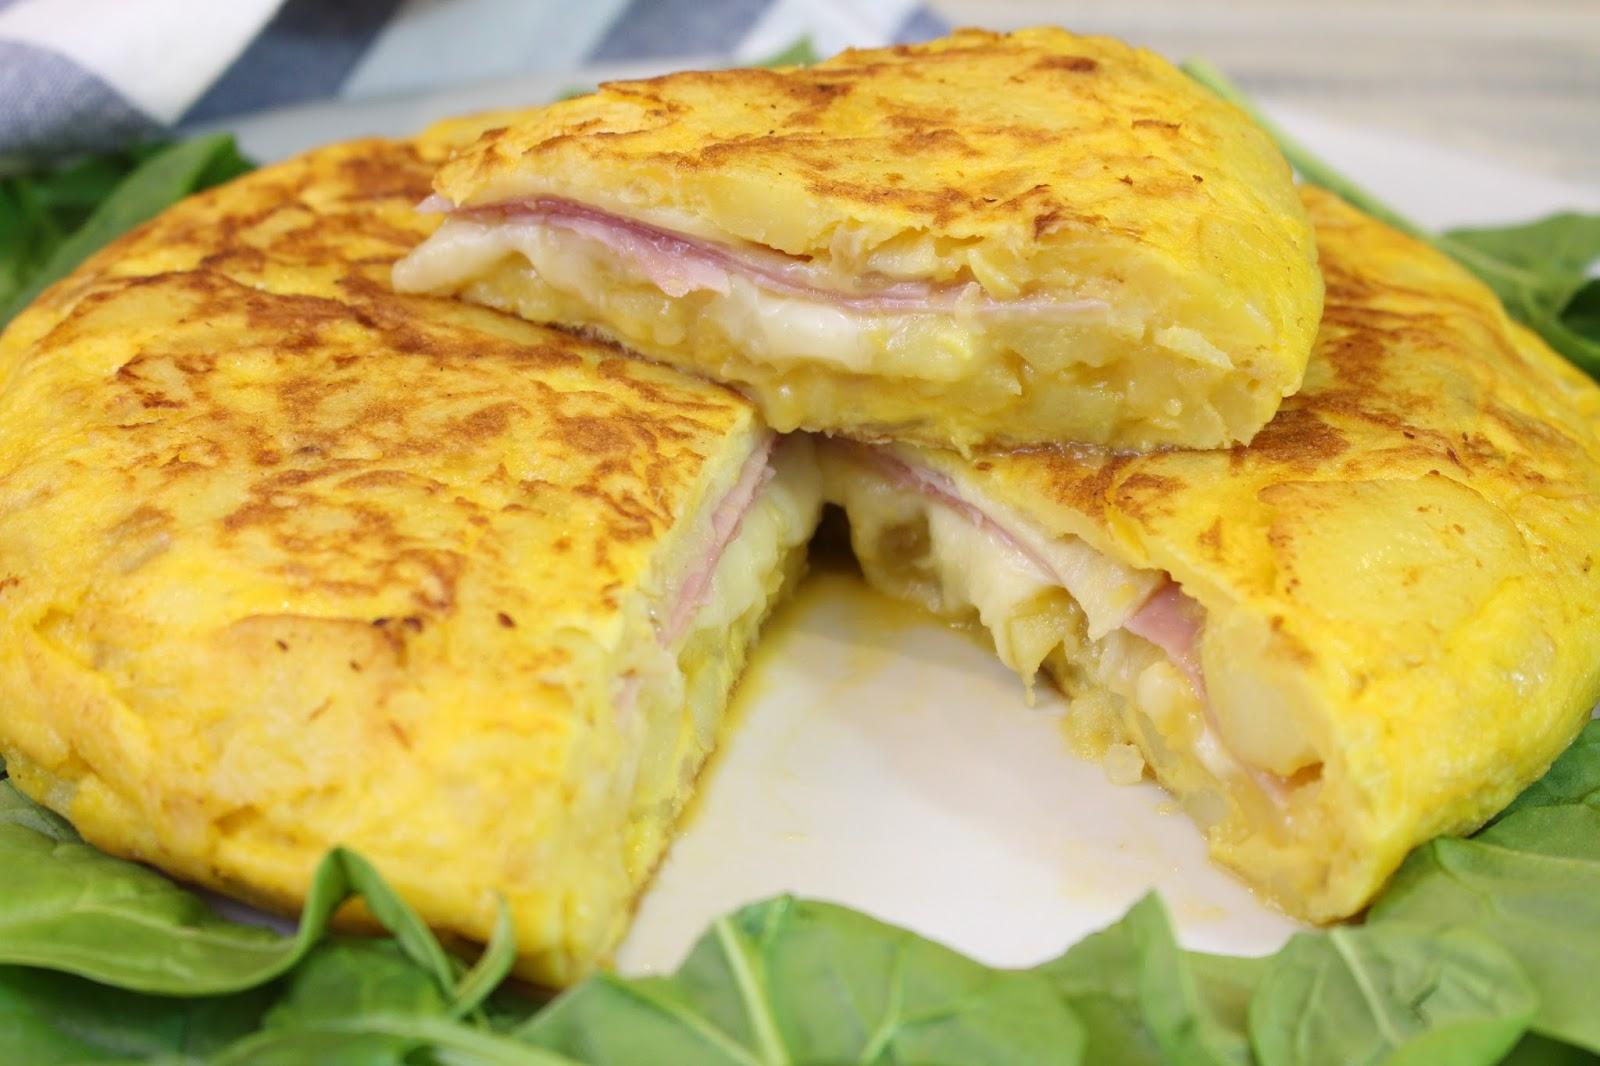 Receta de tortilla de patata rellena de jamón y queso